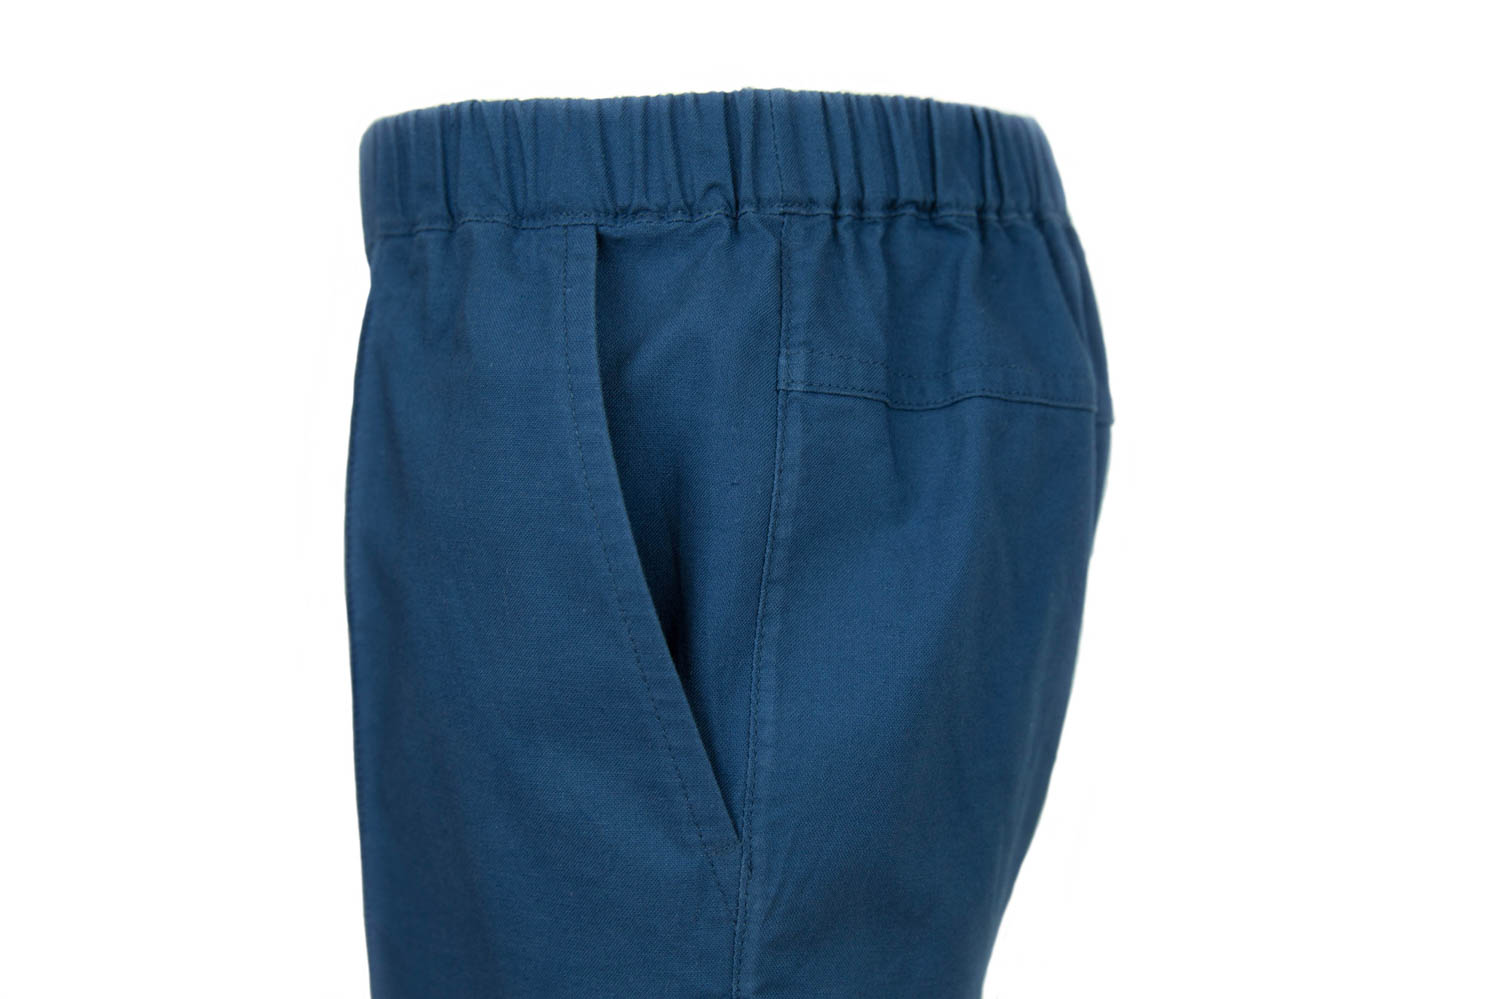 smart_alek-blue-tailored_shorts-02.jpg